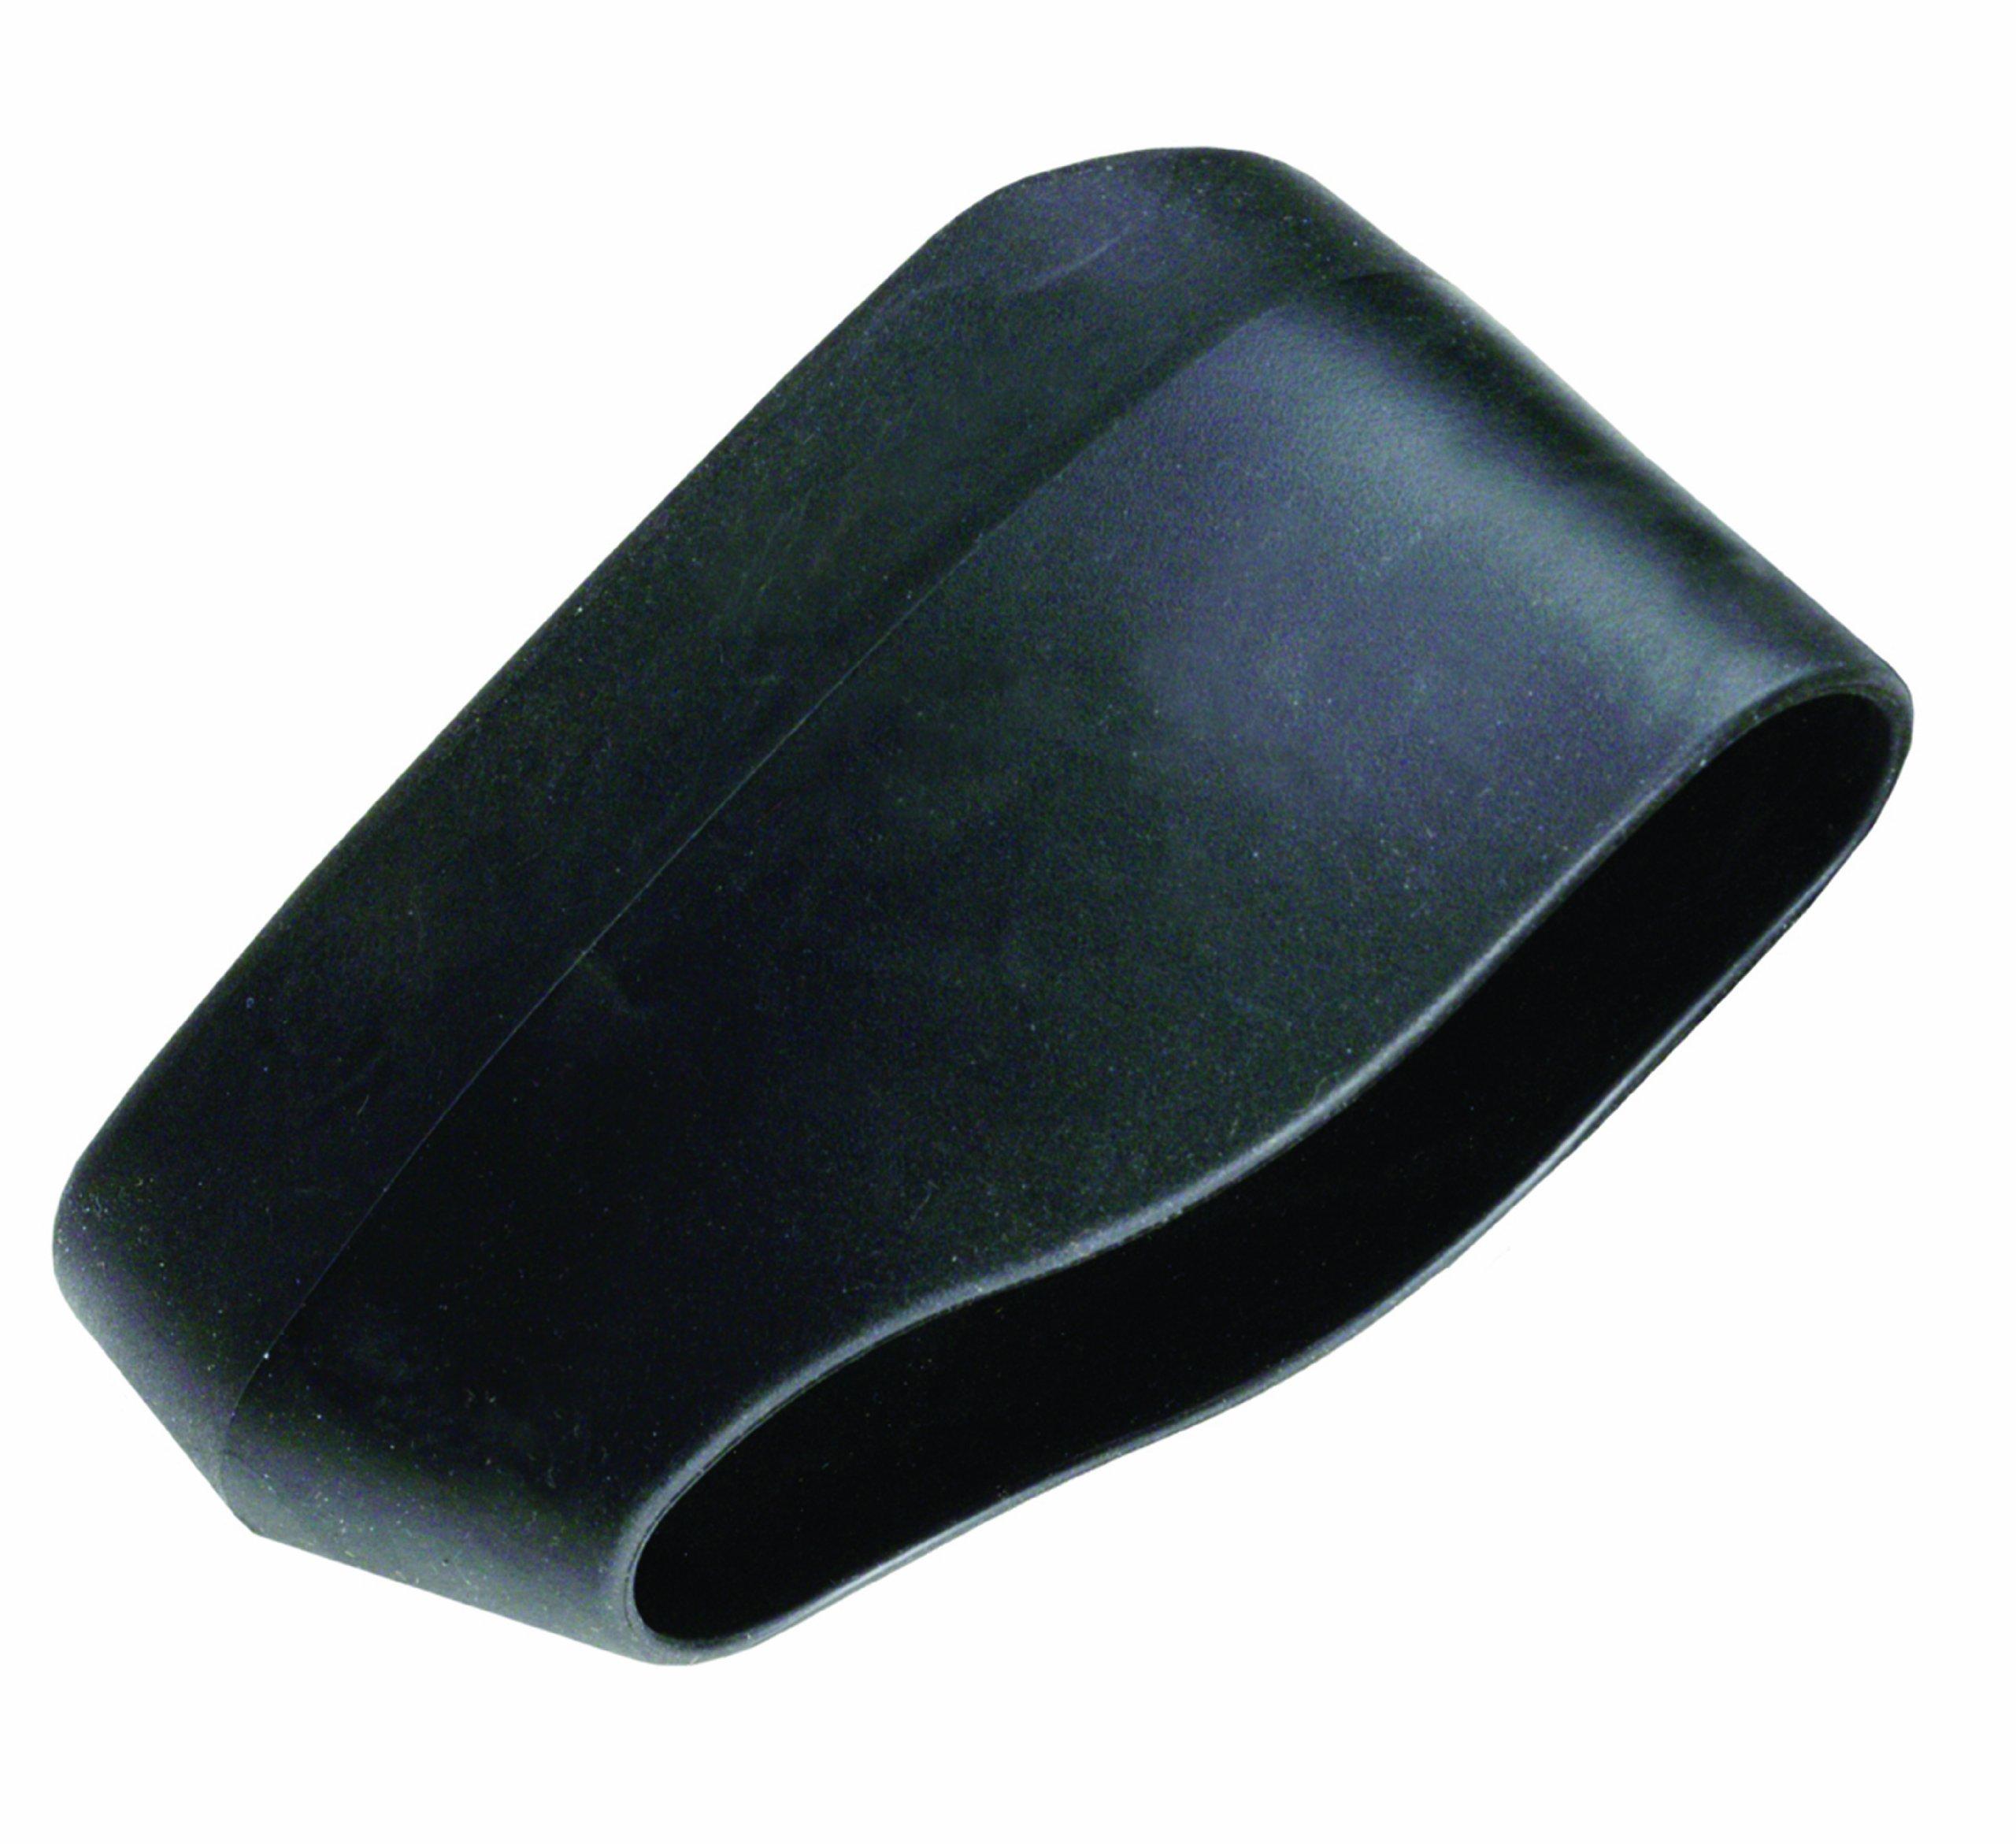 HIVIZ SP-S Slip On Recoil Pad, Small